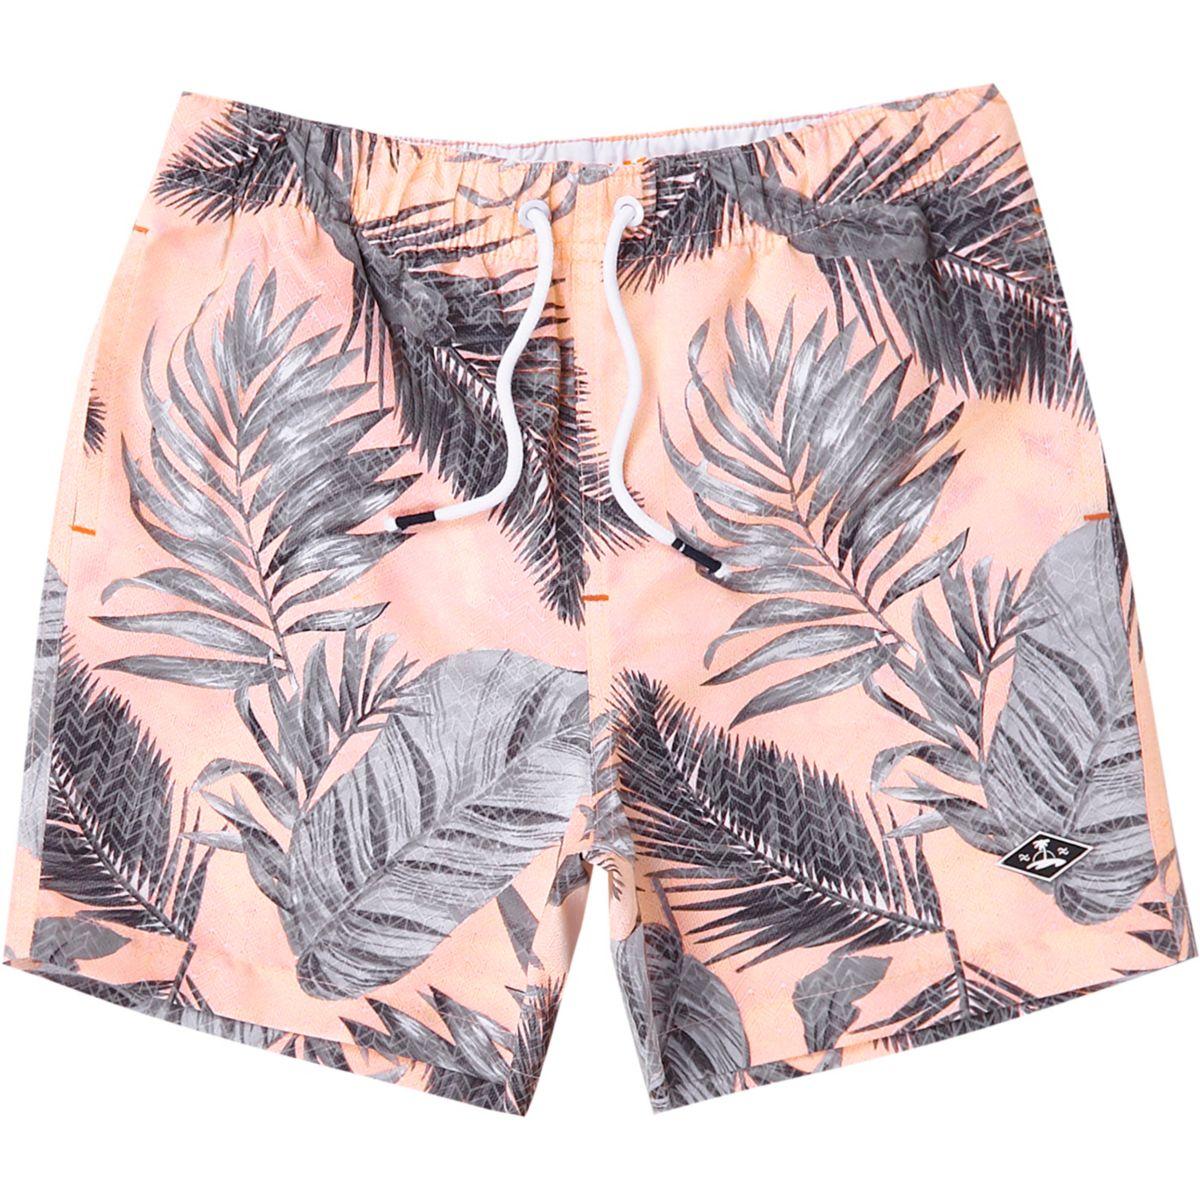 Boys pink floral print swim shorts